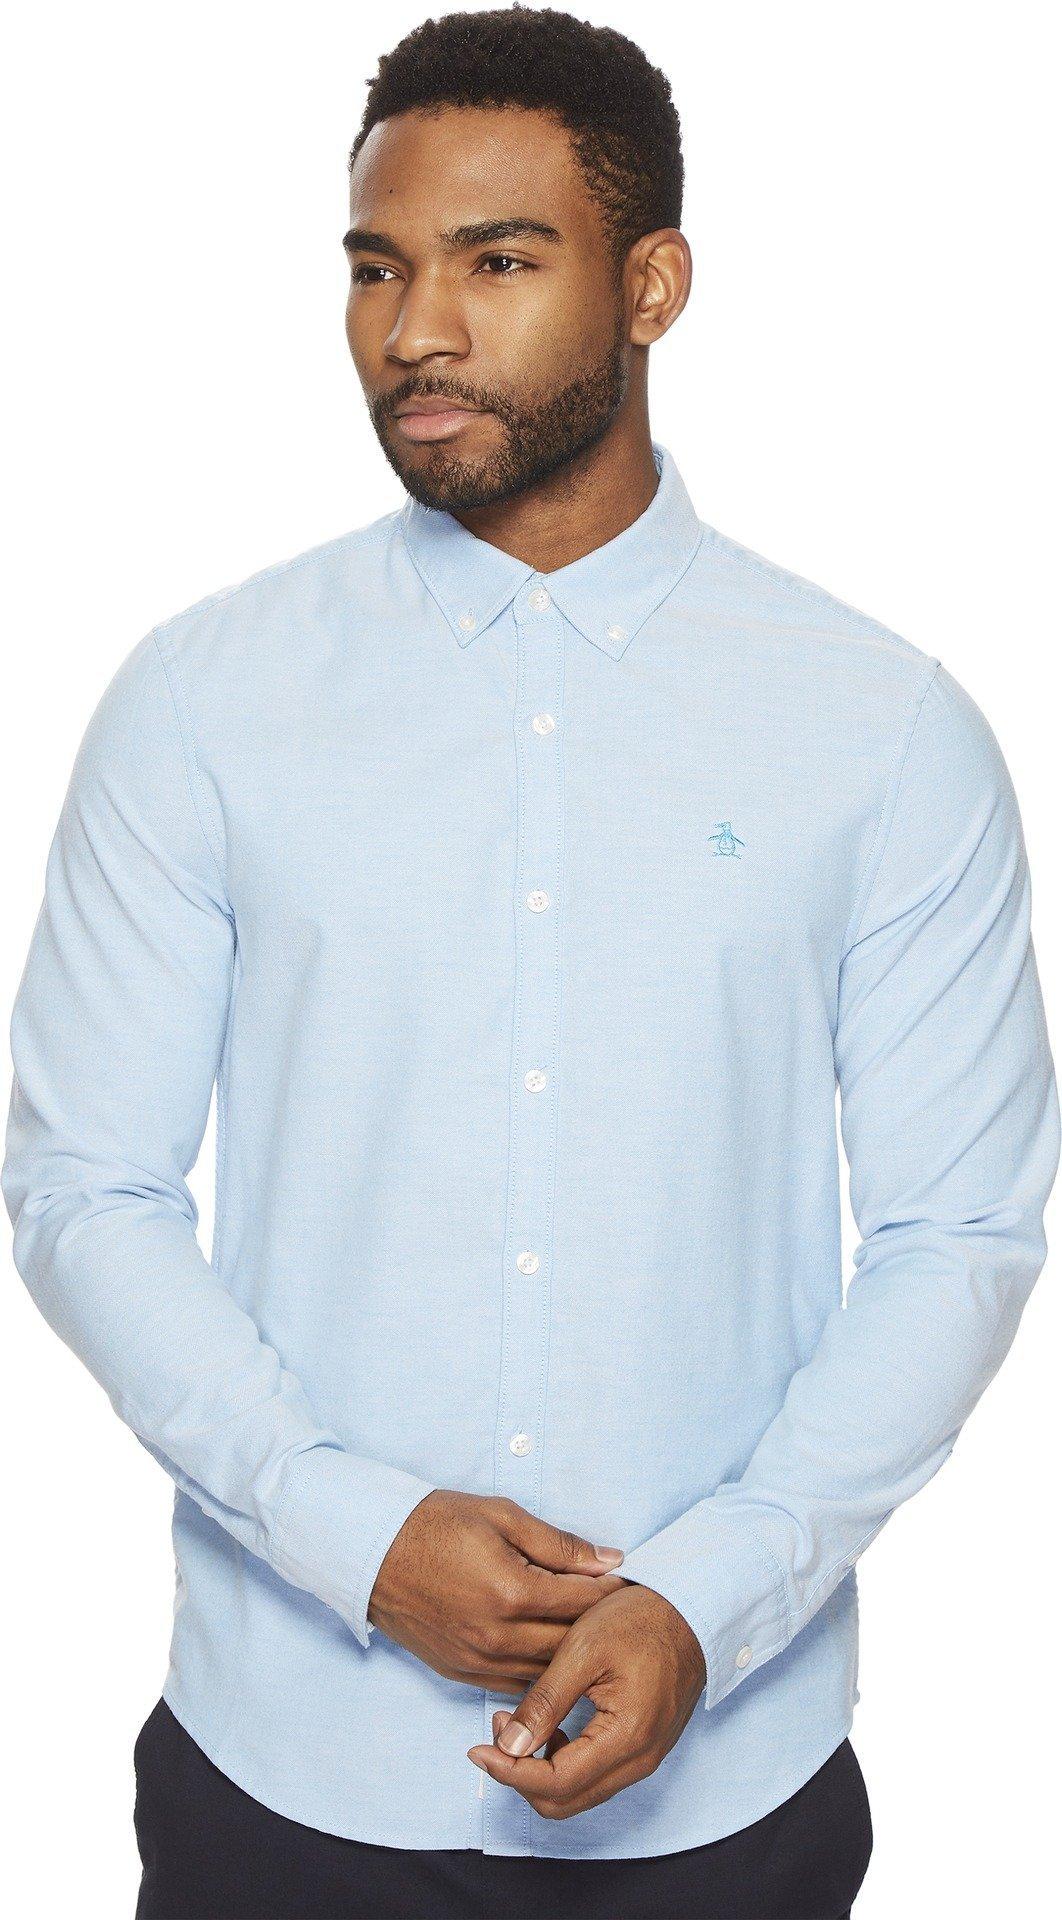 Original Penguin Men's New Long Sleeve Oxford Stretch Shirt, Dresden Blue, Extra Large